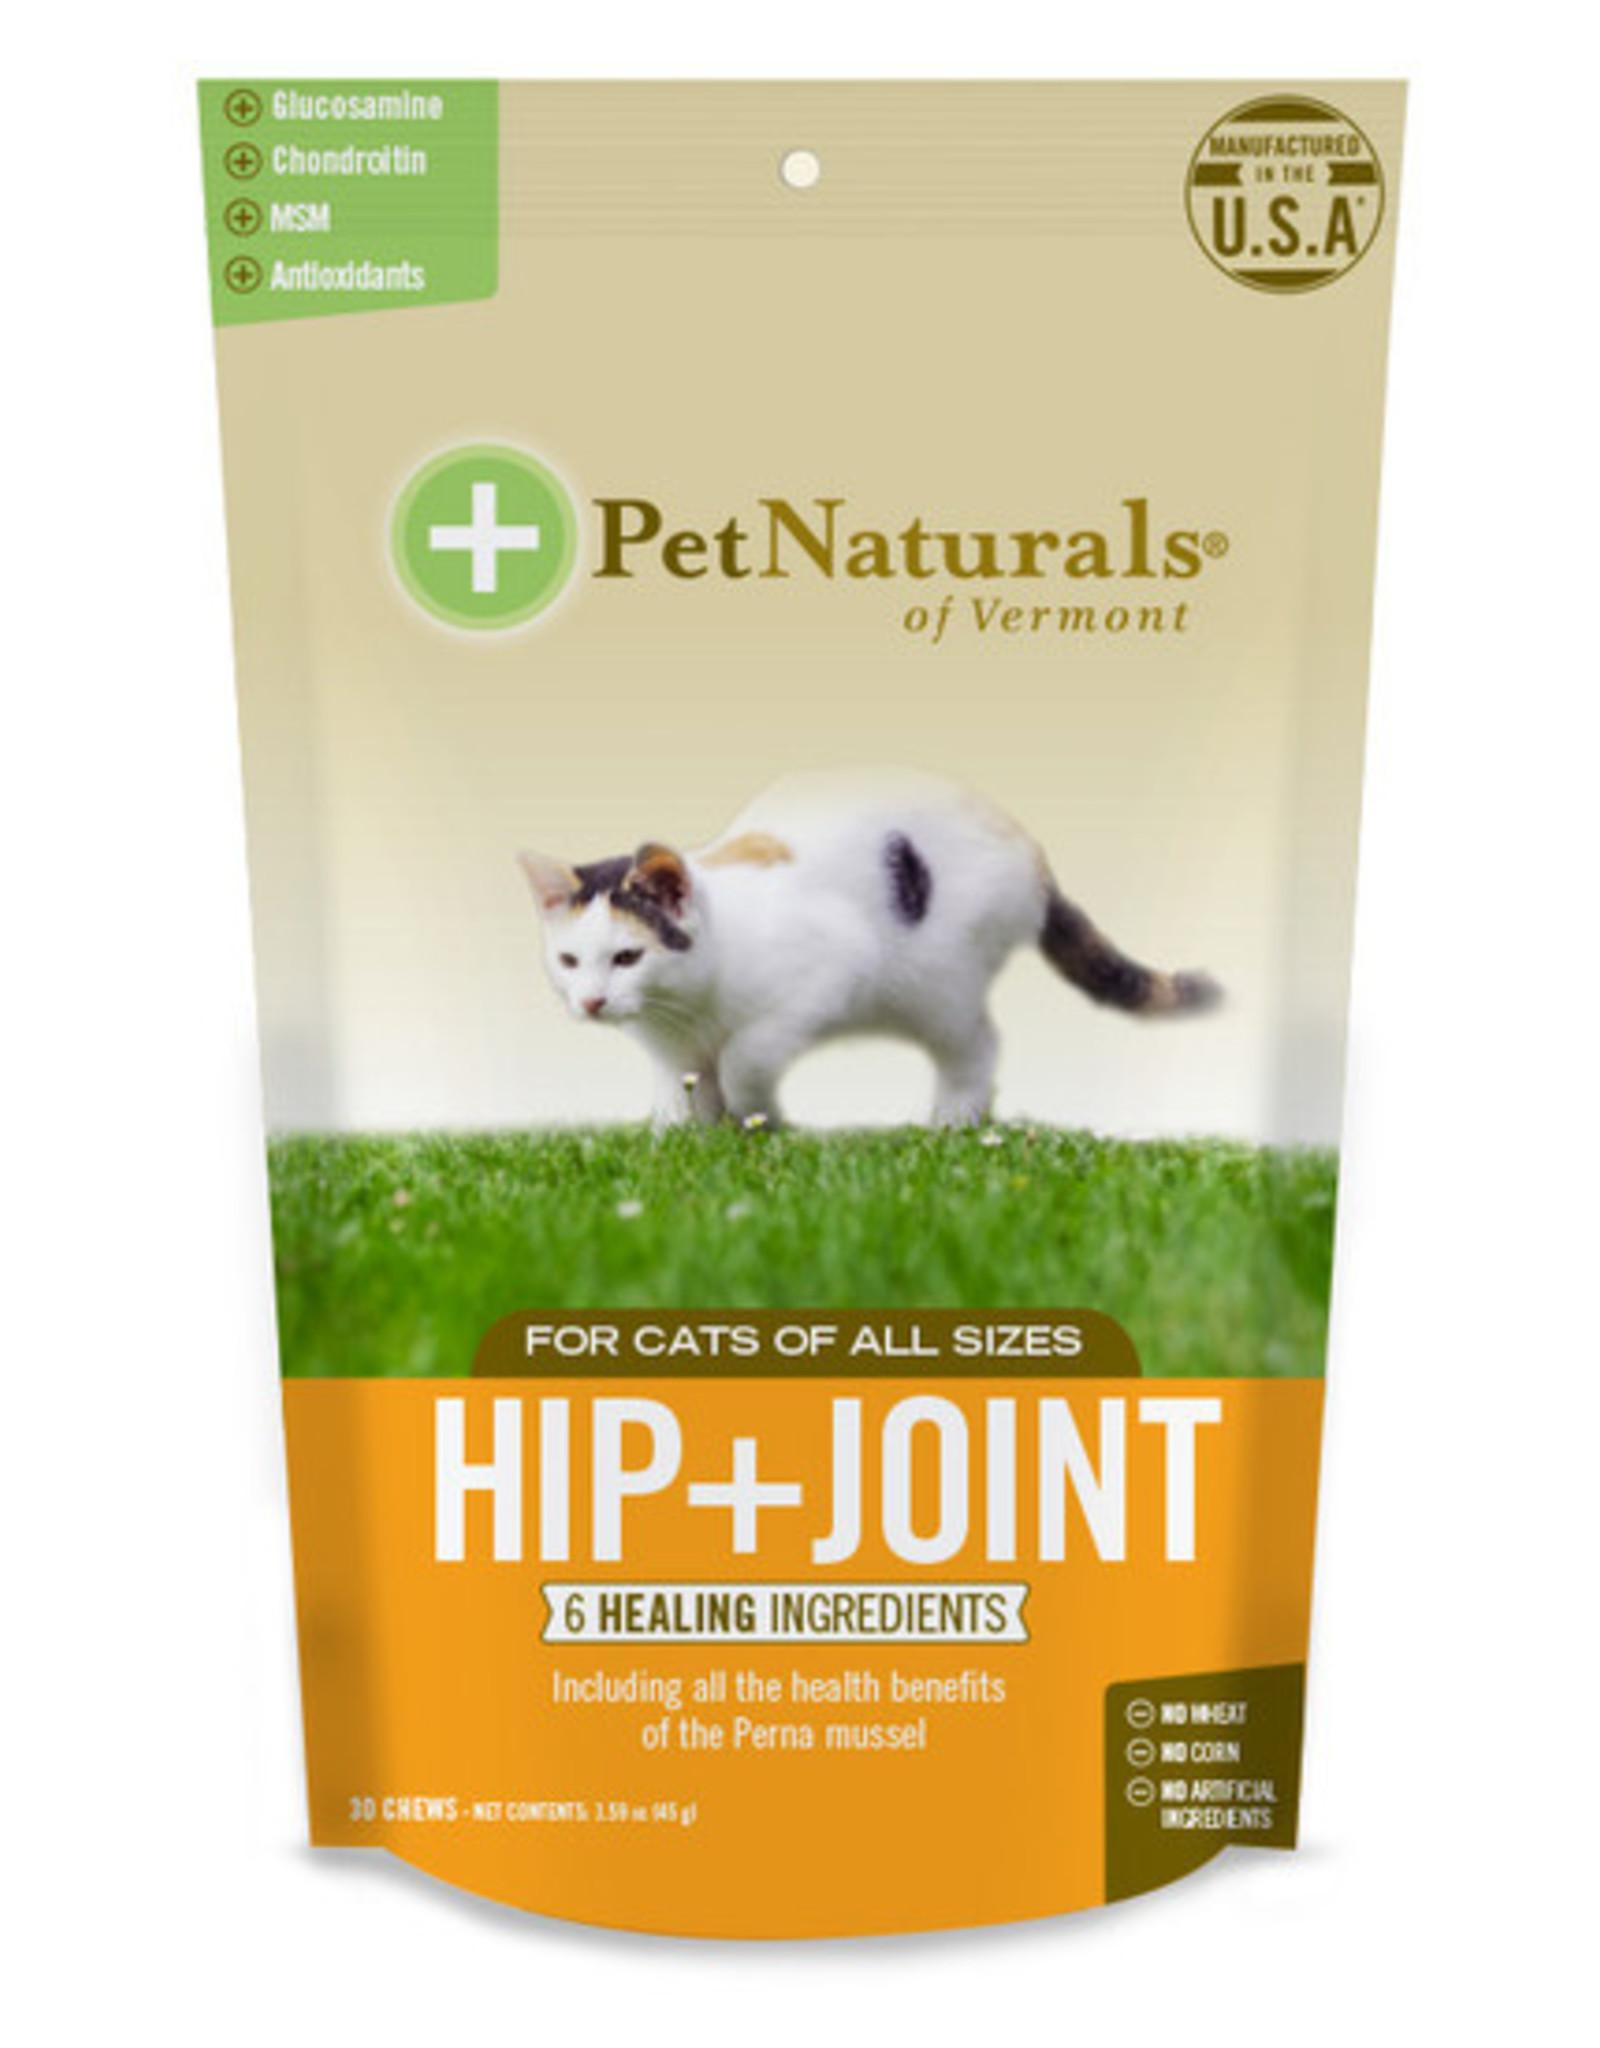 Pet Naturals Pet Naturals of Vermont Cat Hip and Joint Chews 30ct